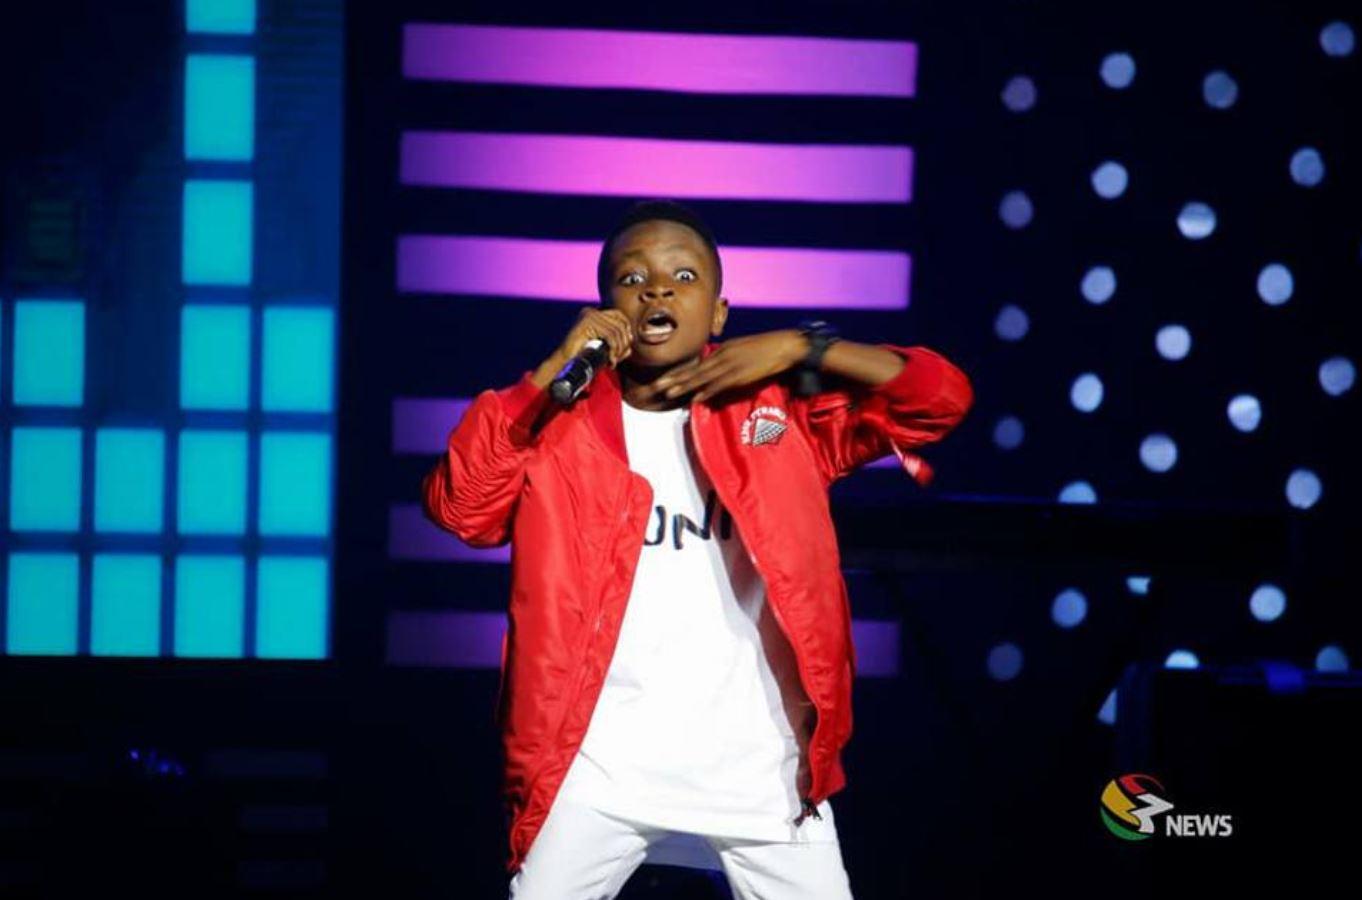 Samuel Owusu wins TV3 talented kids season 9 - Sarkodie Joined him on stage